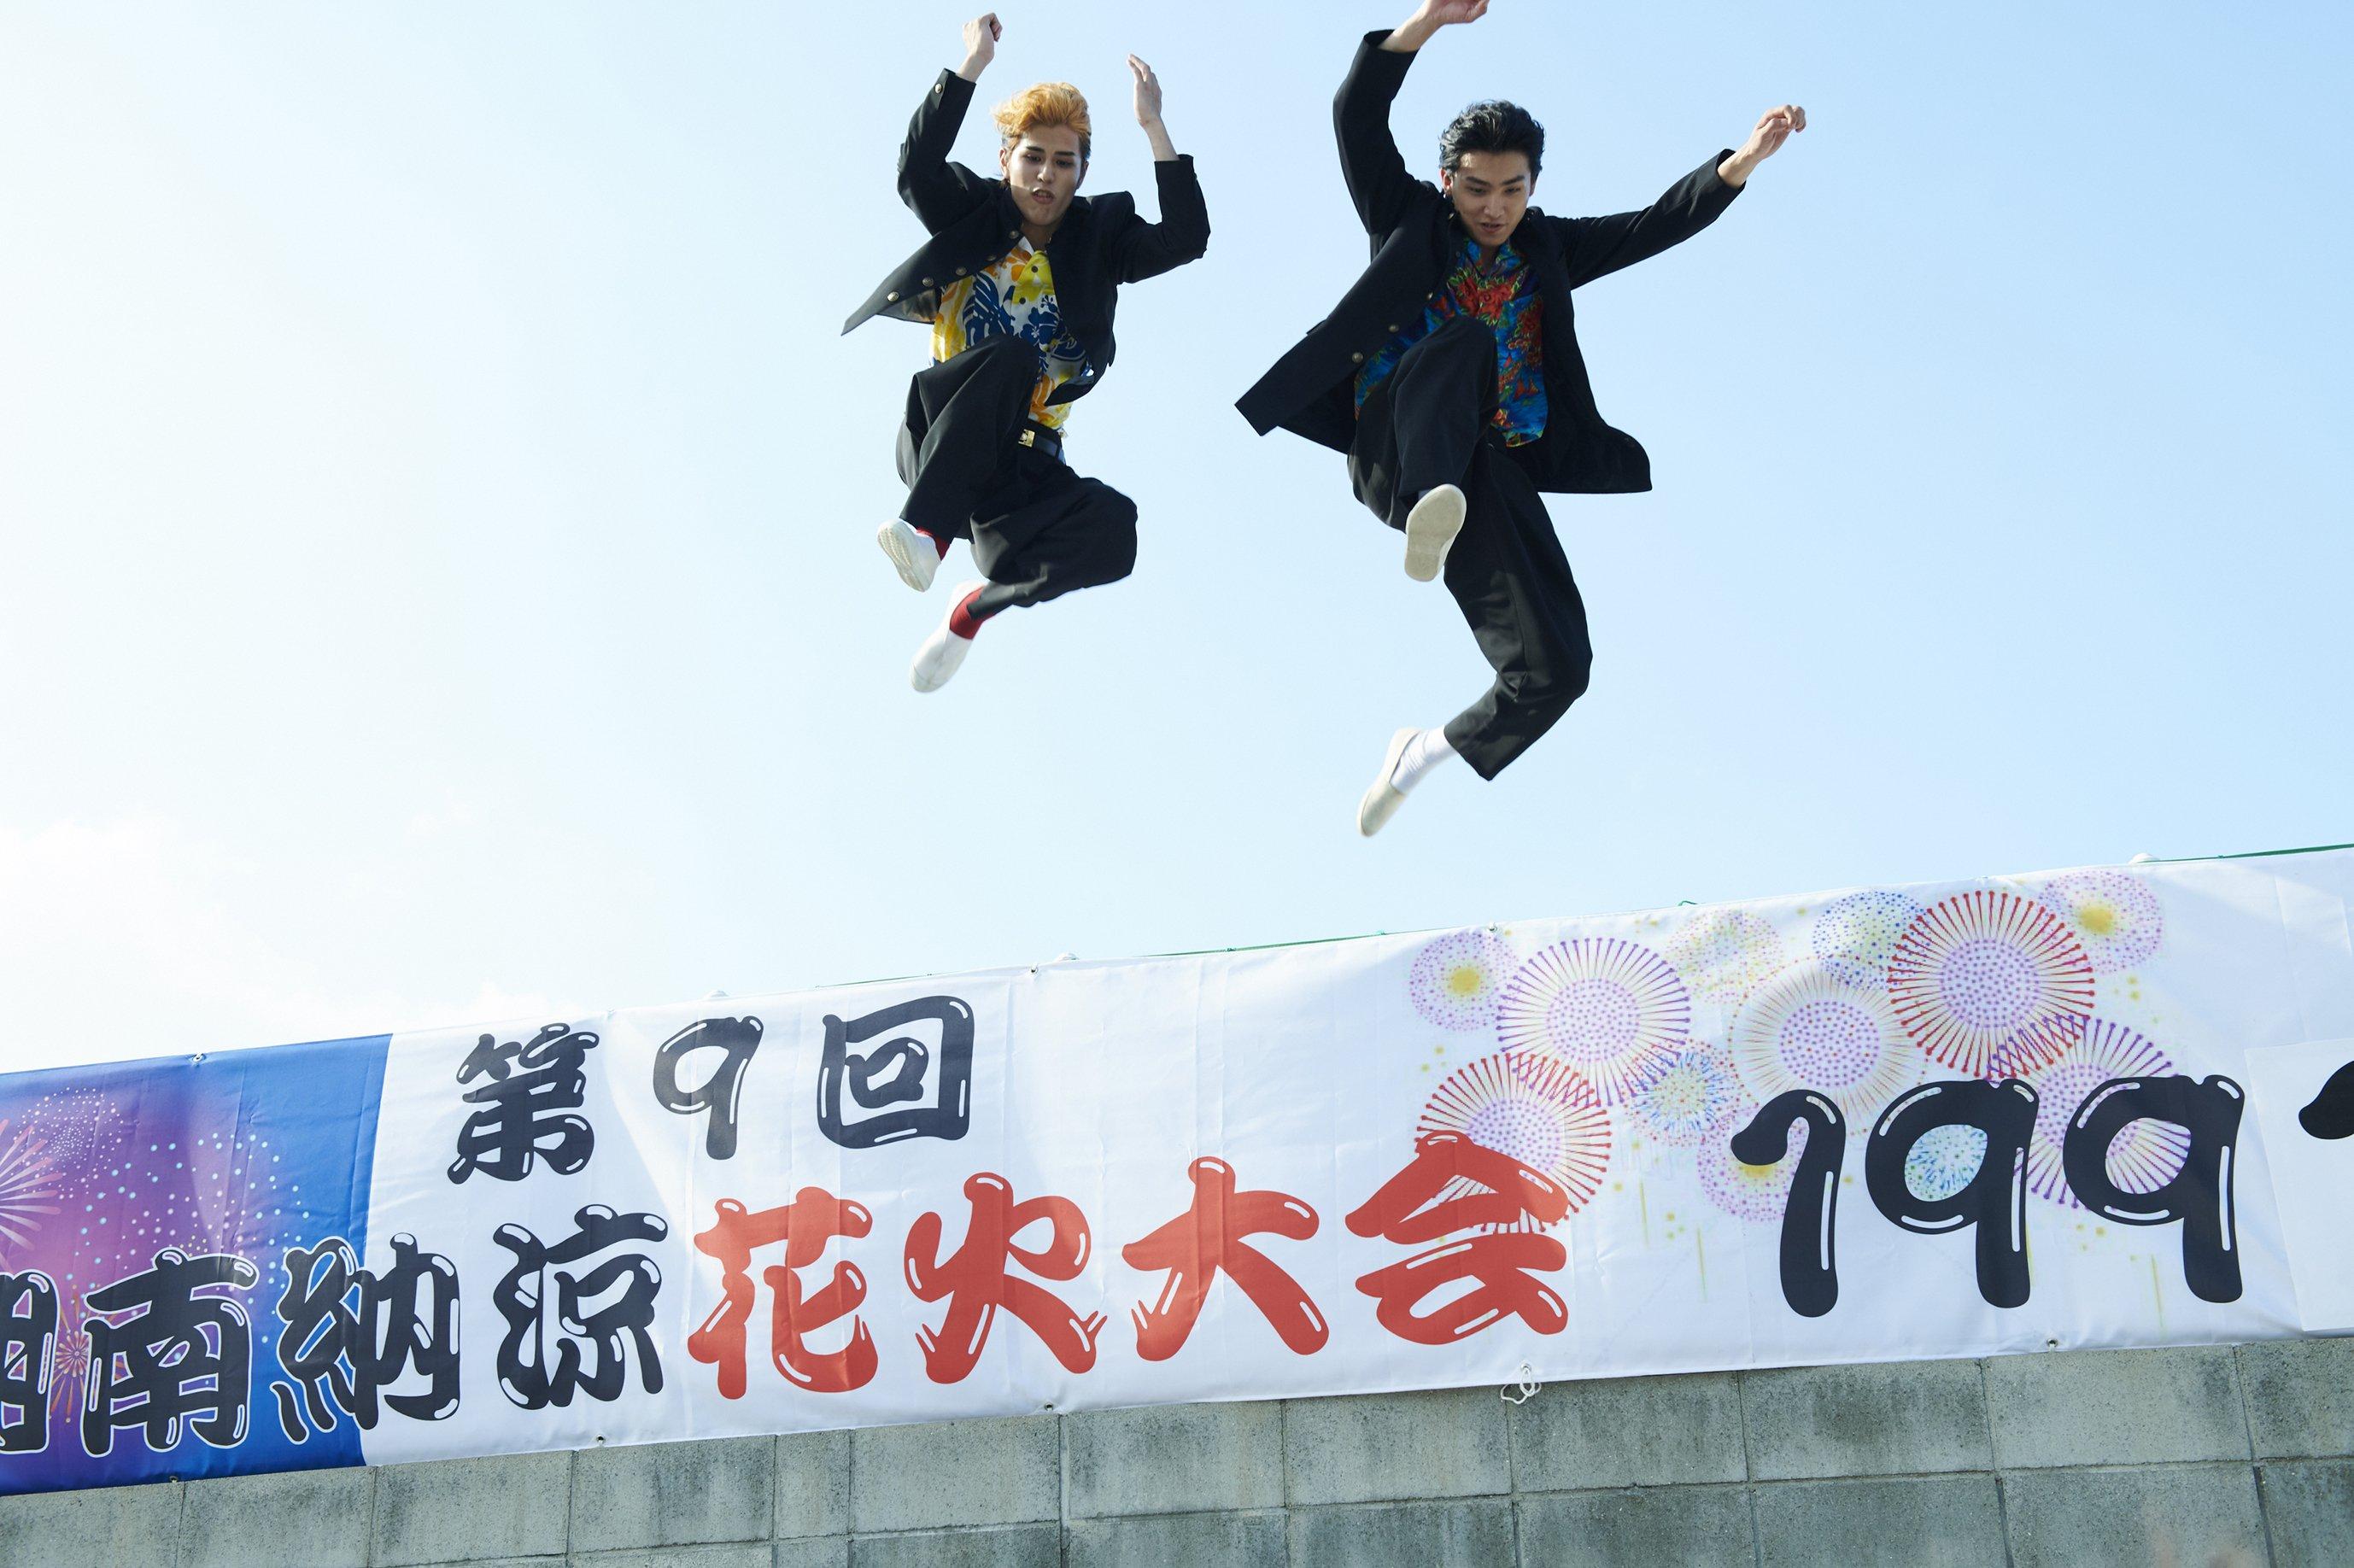 『GTO』の原点、ヤンキー漫画『湘南純愛組!』が寛一郎&金子大地で実写化決定の画像001